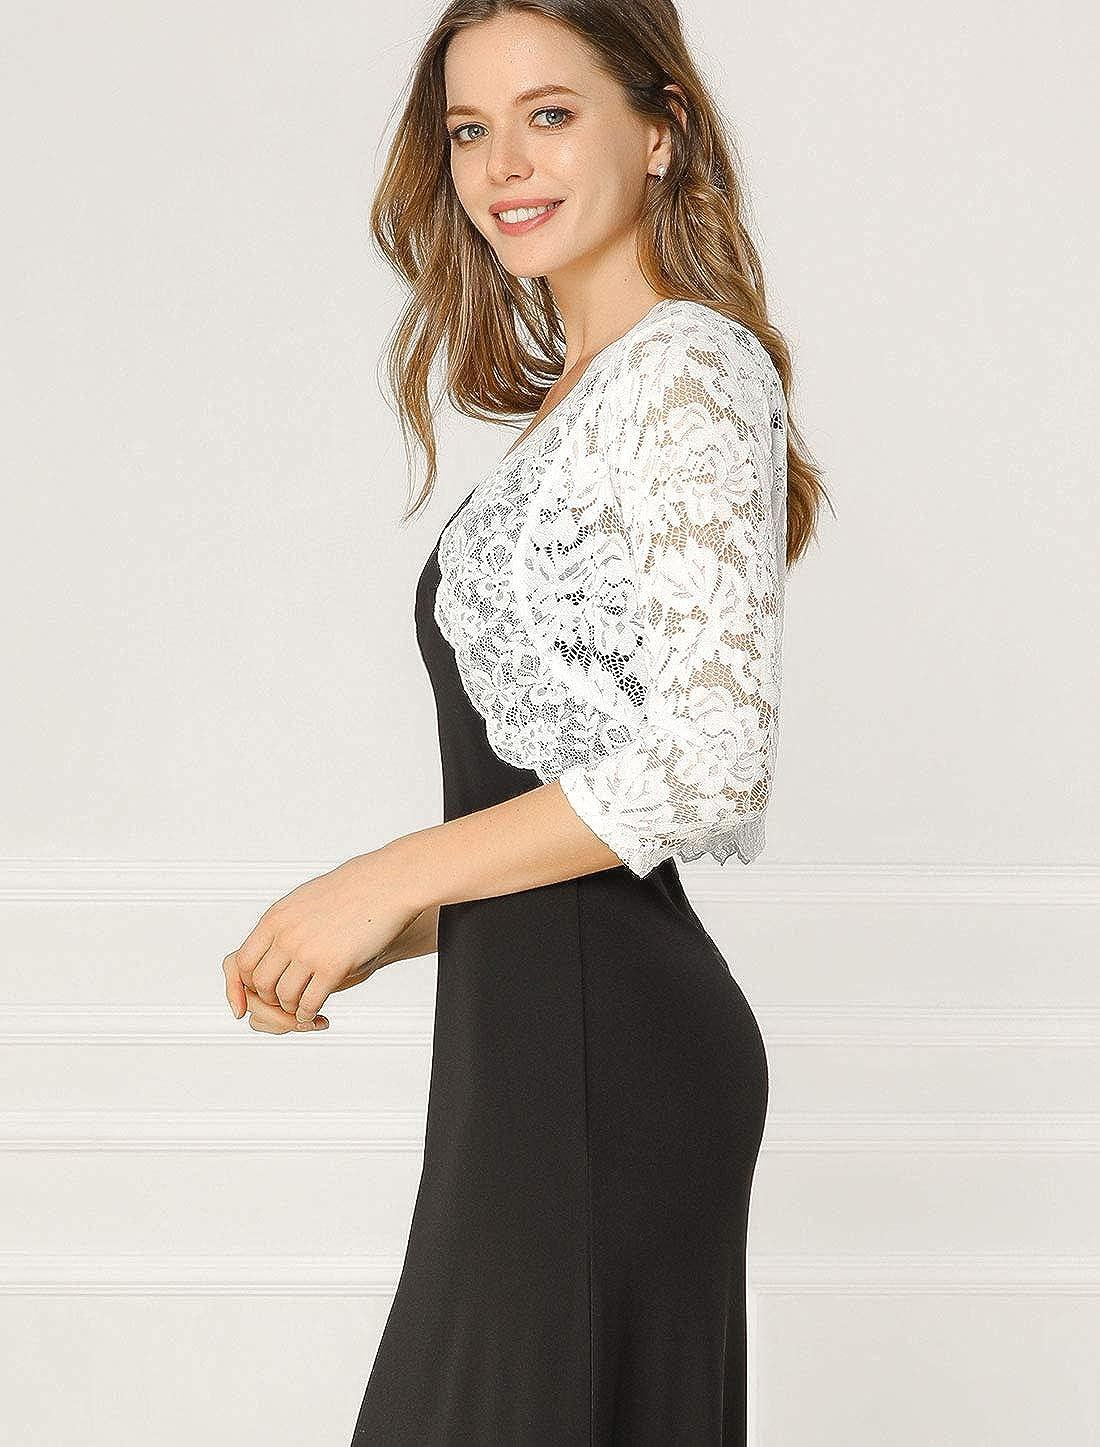 Allegra K Women's Elegant 3/4 Sleeve Sheer Floral Lace Shrug Top